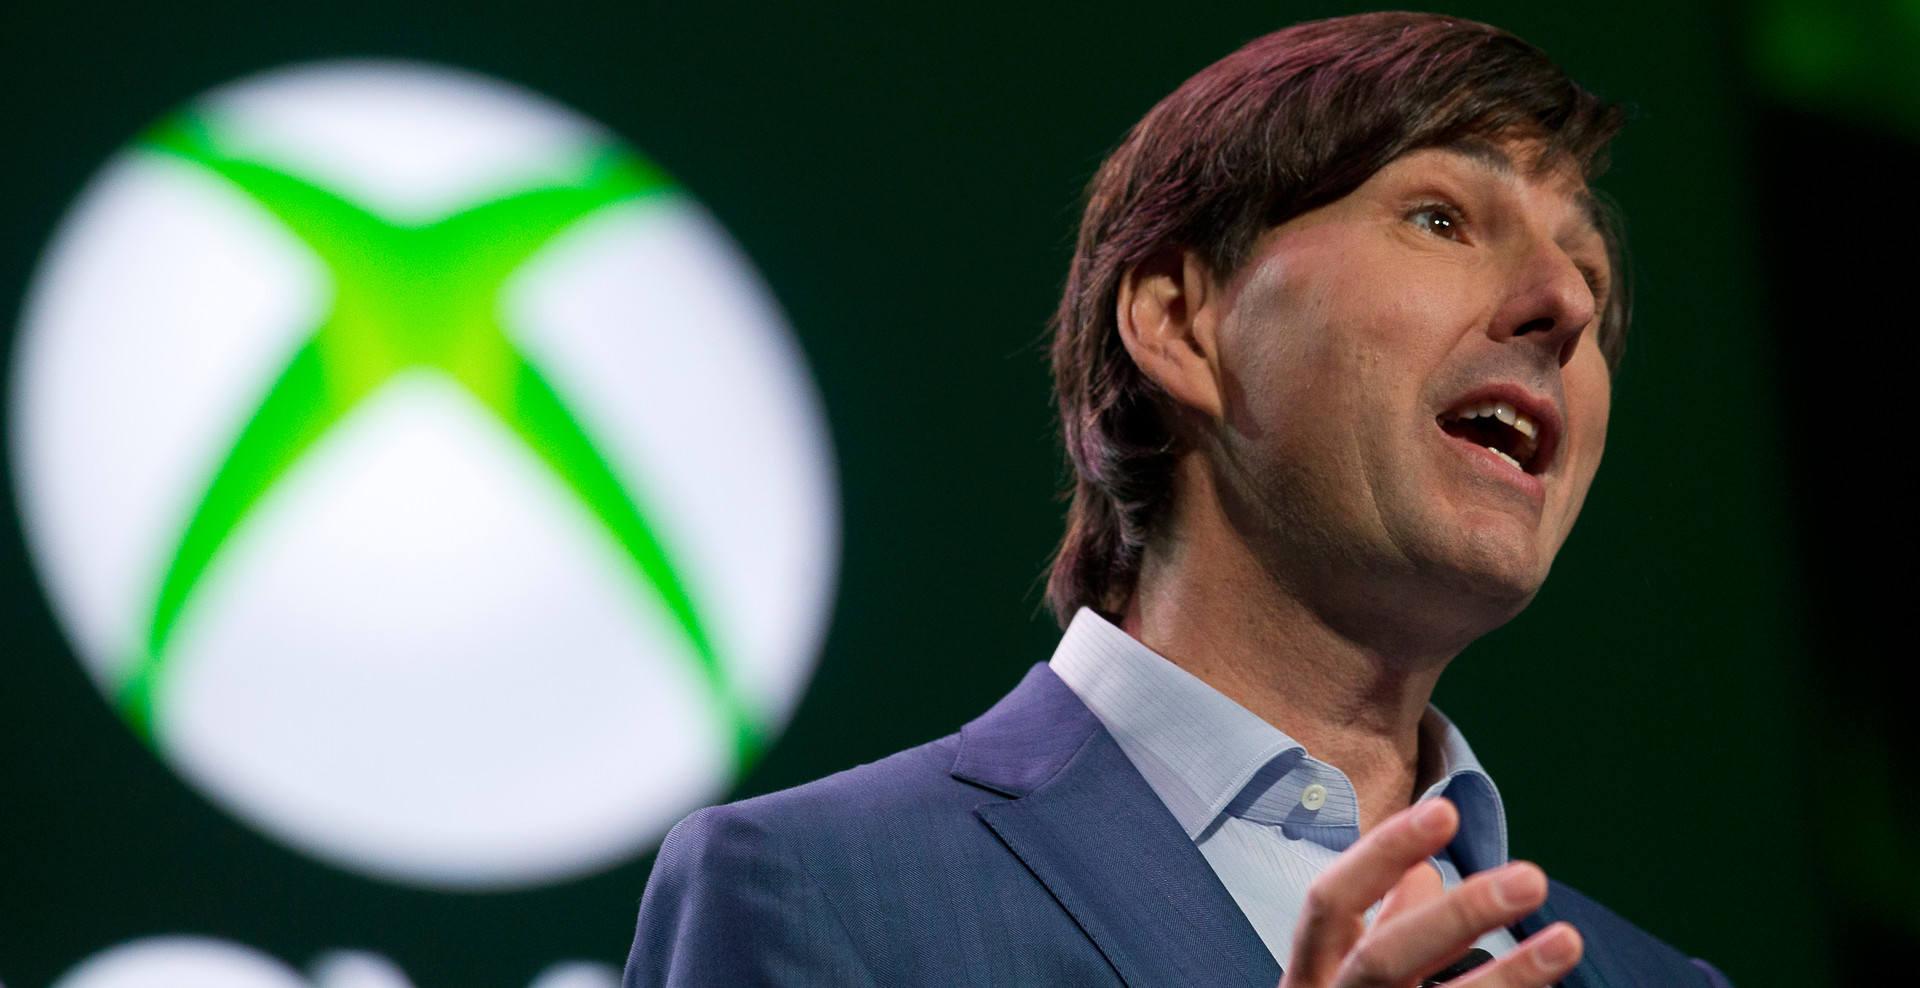 Don Mattrick quitte Microsoft et s'en va chez Zynga